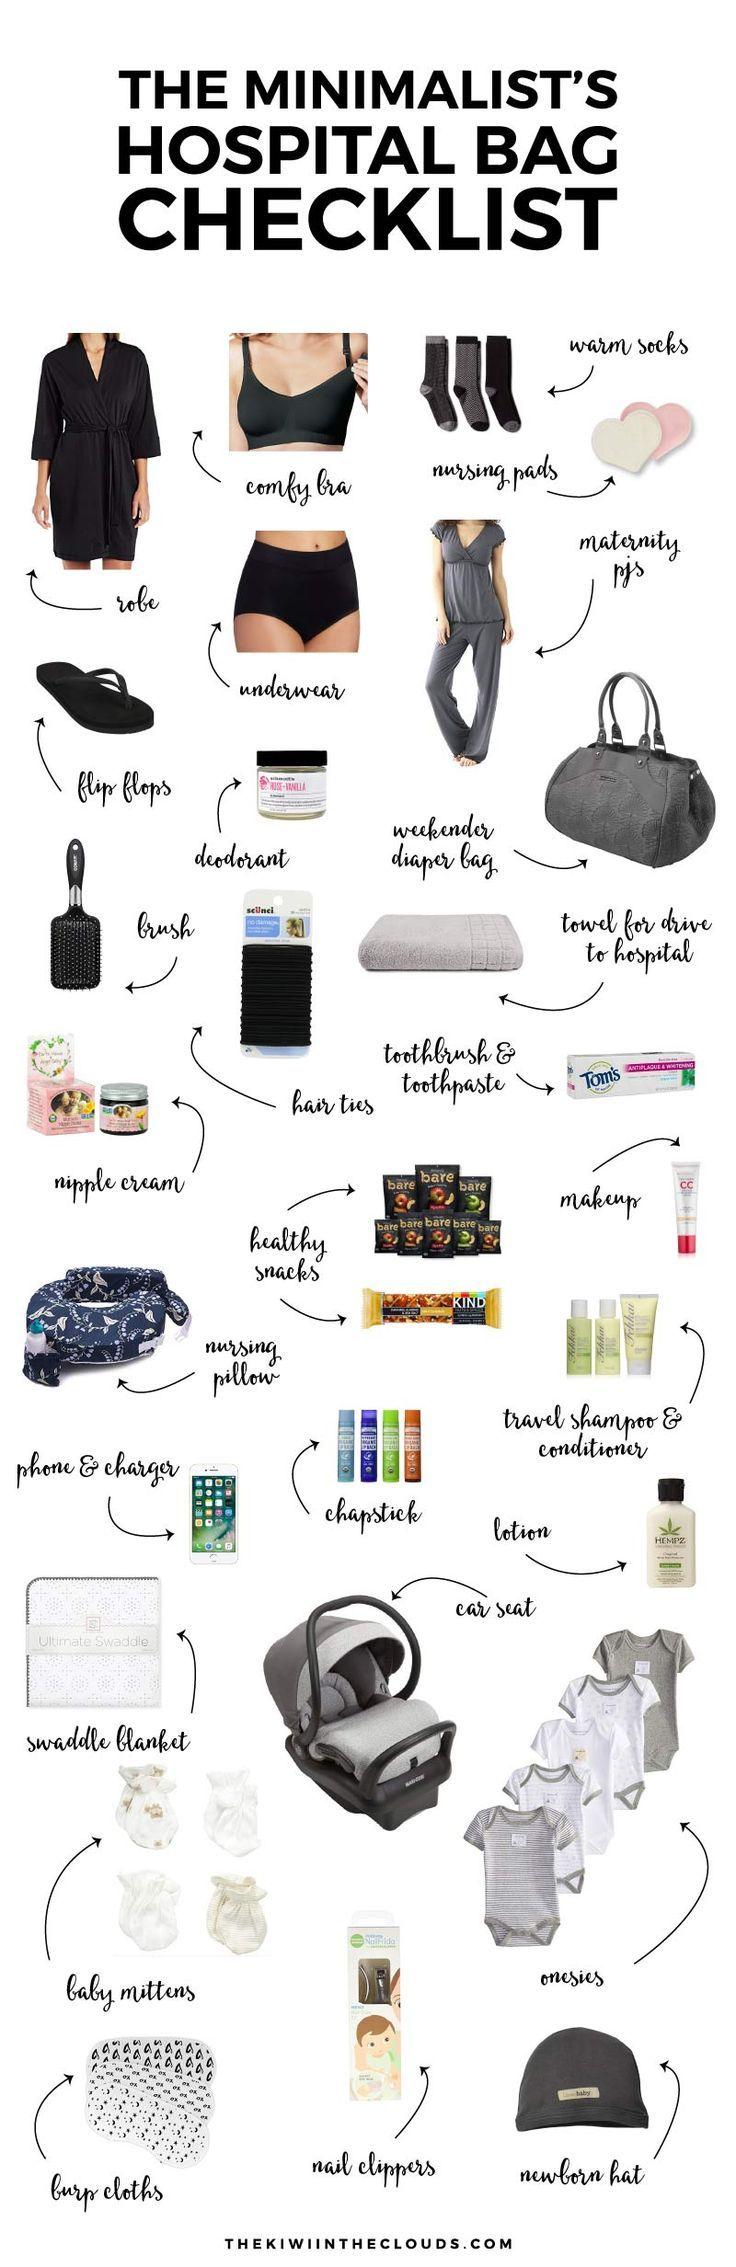 Hospital Bag Checklist | Newborn Advice | Pregnancy Tips